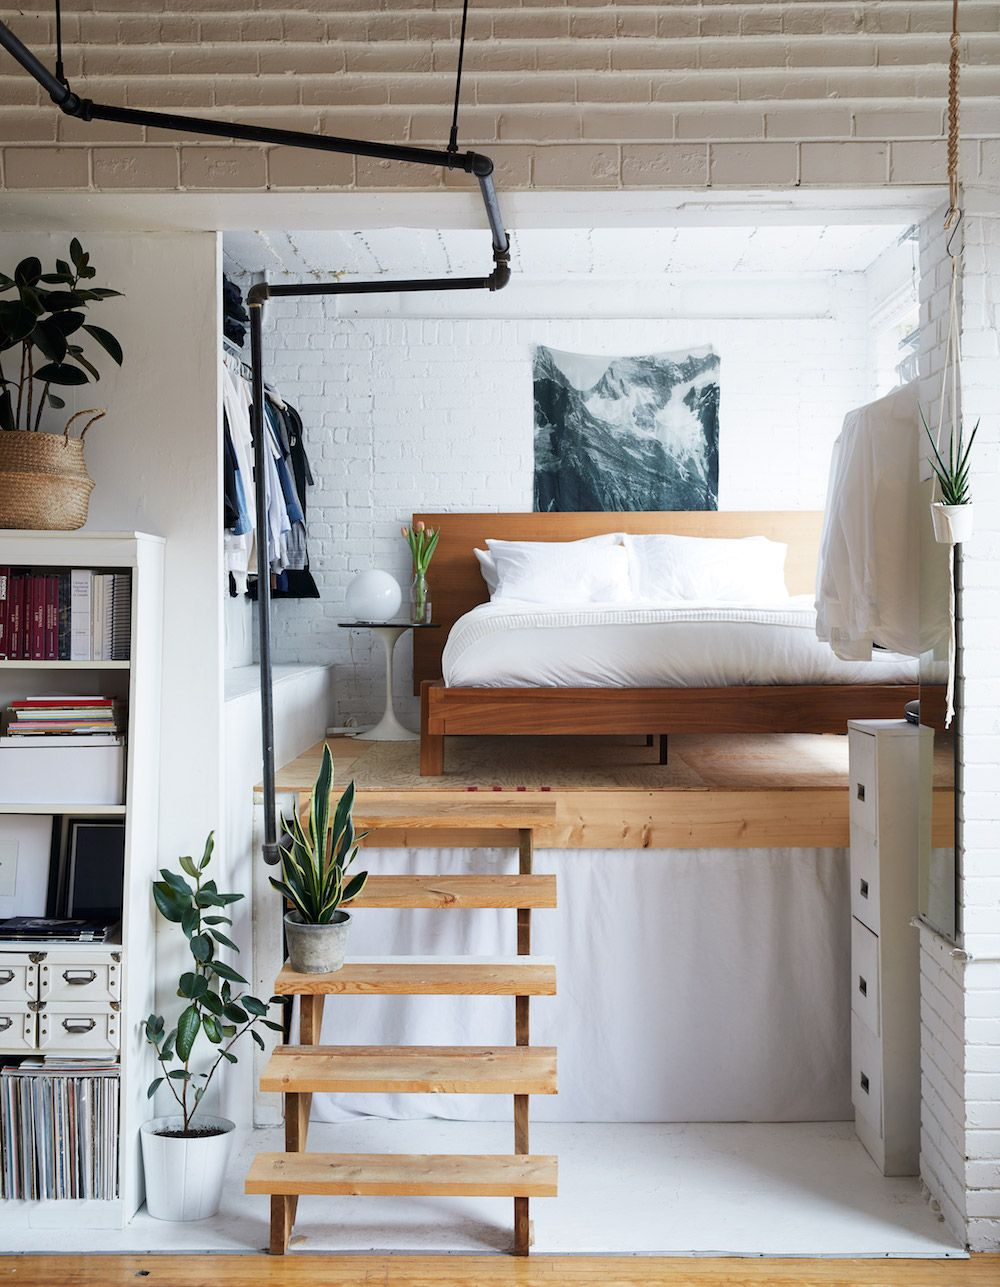 Fantastiskt loft sovrum